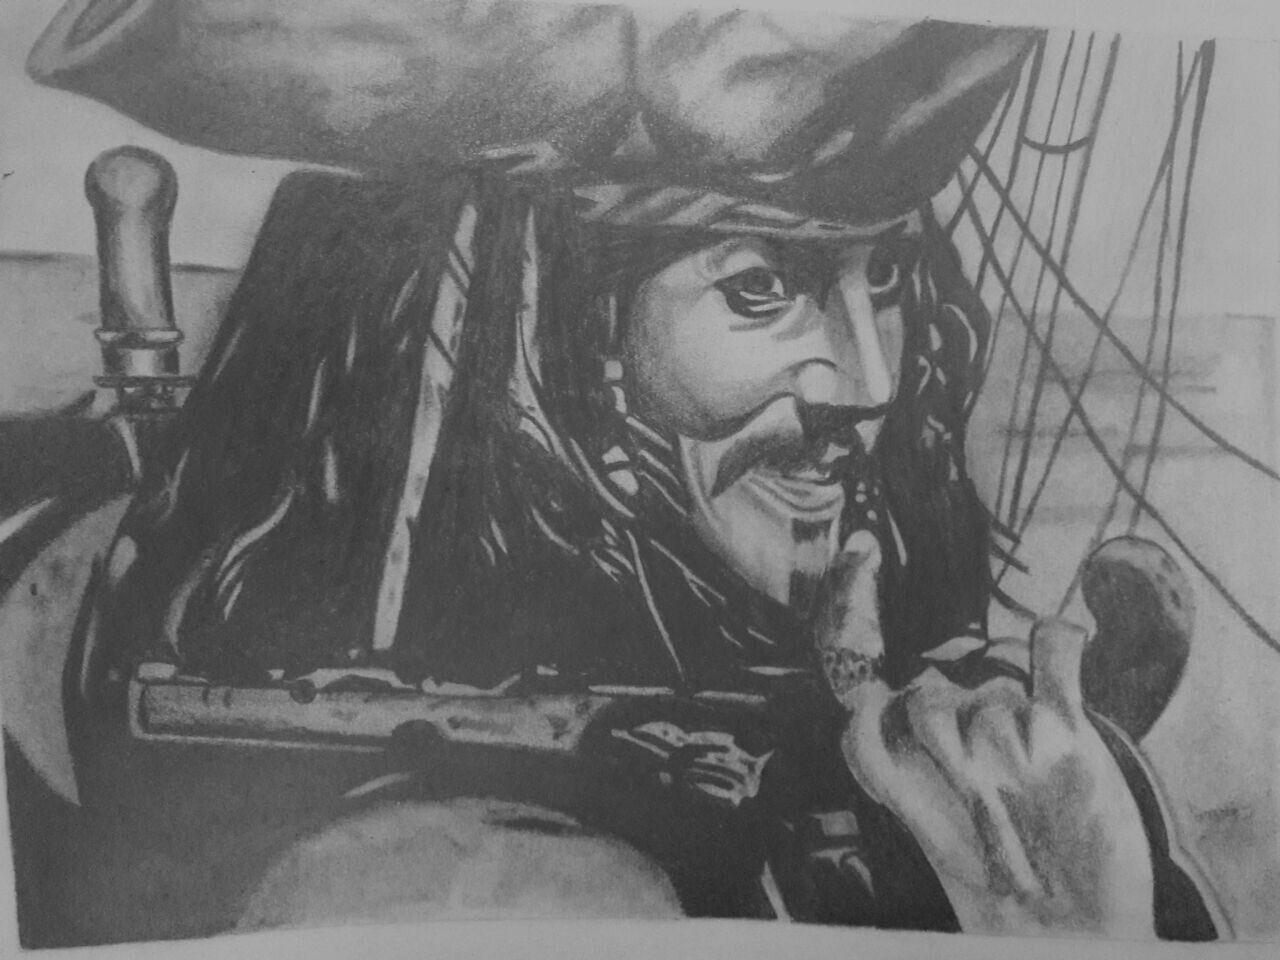 #Jack #sparrow #piratas #b&w